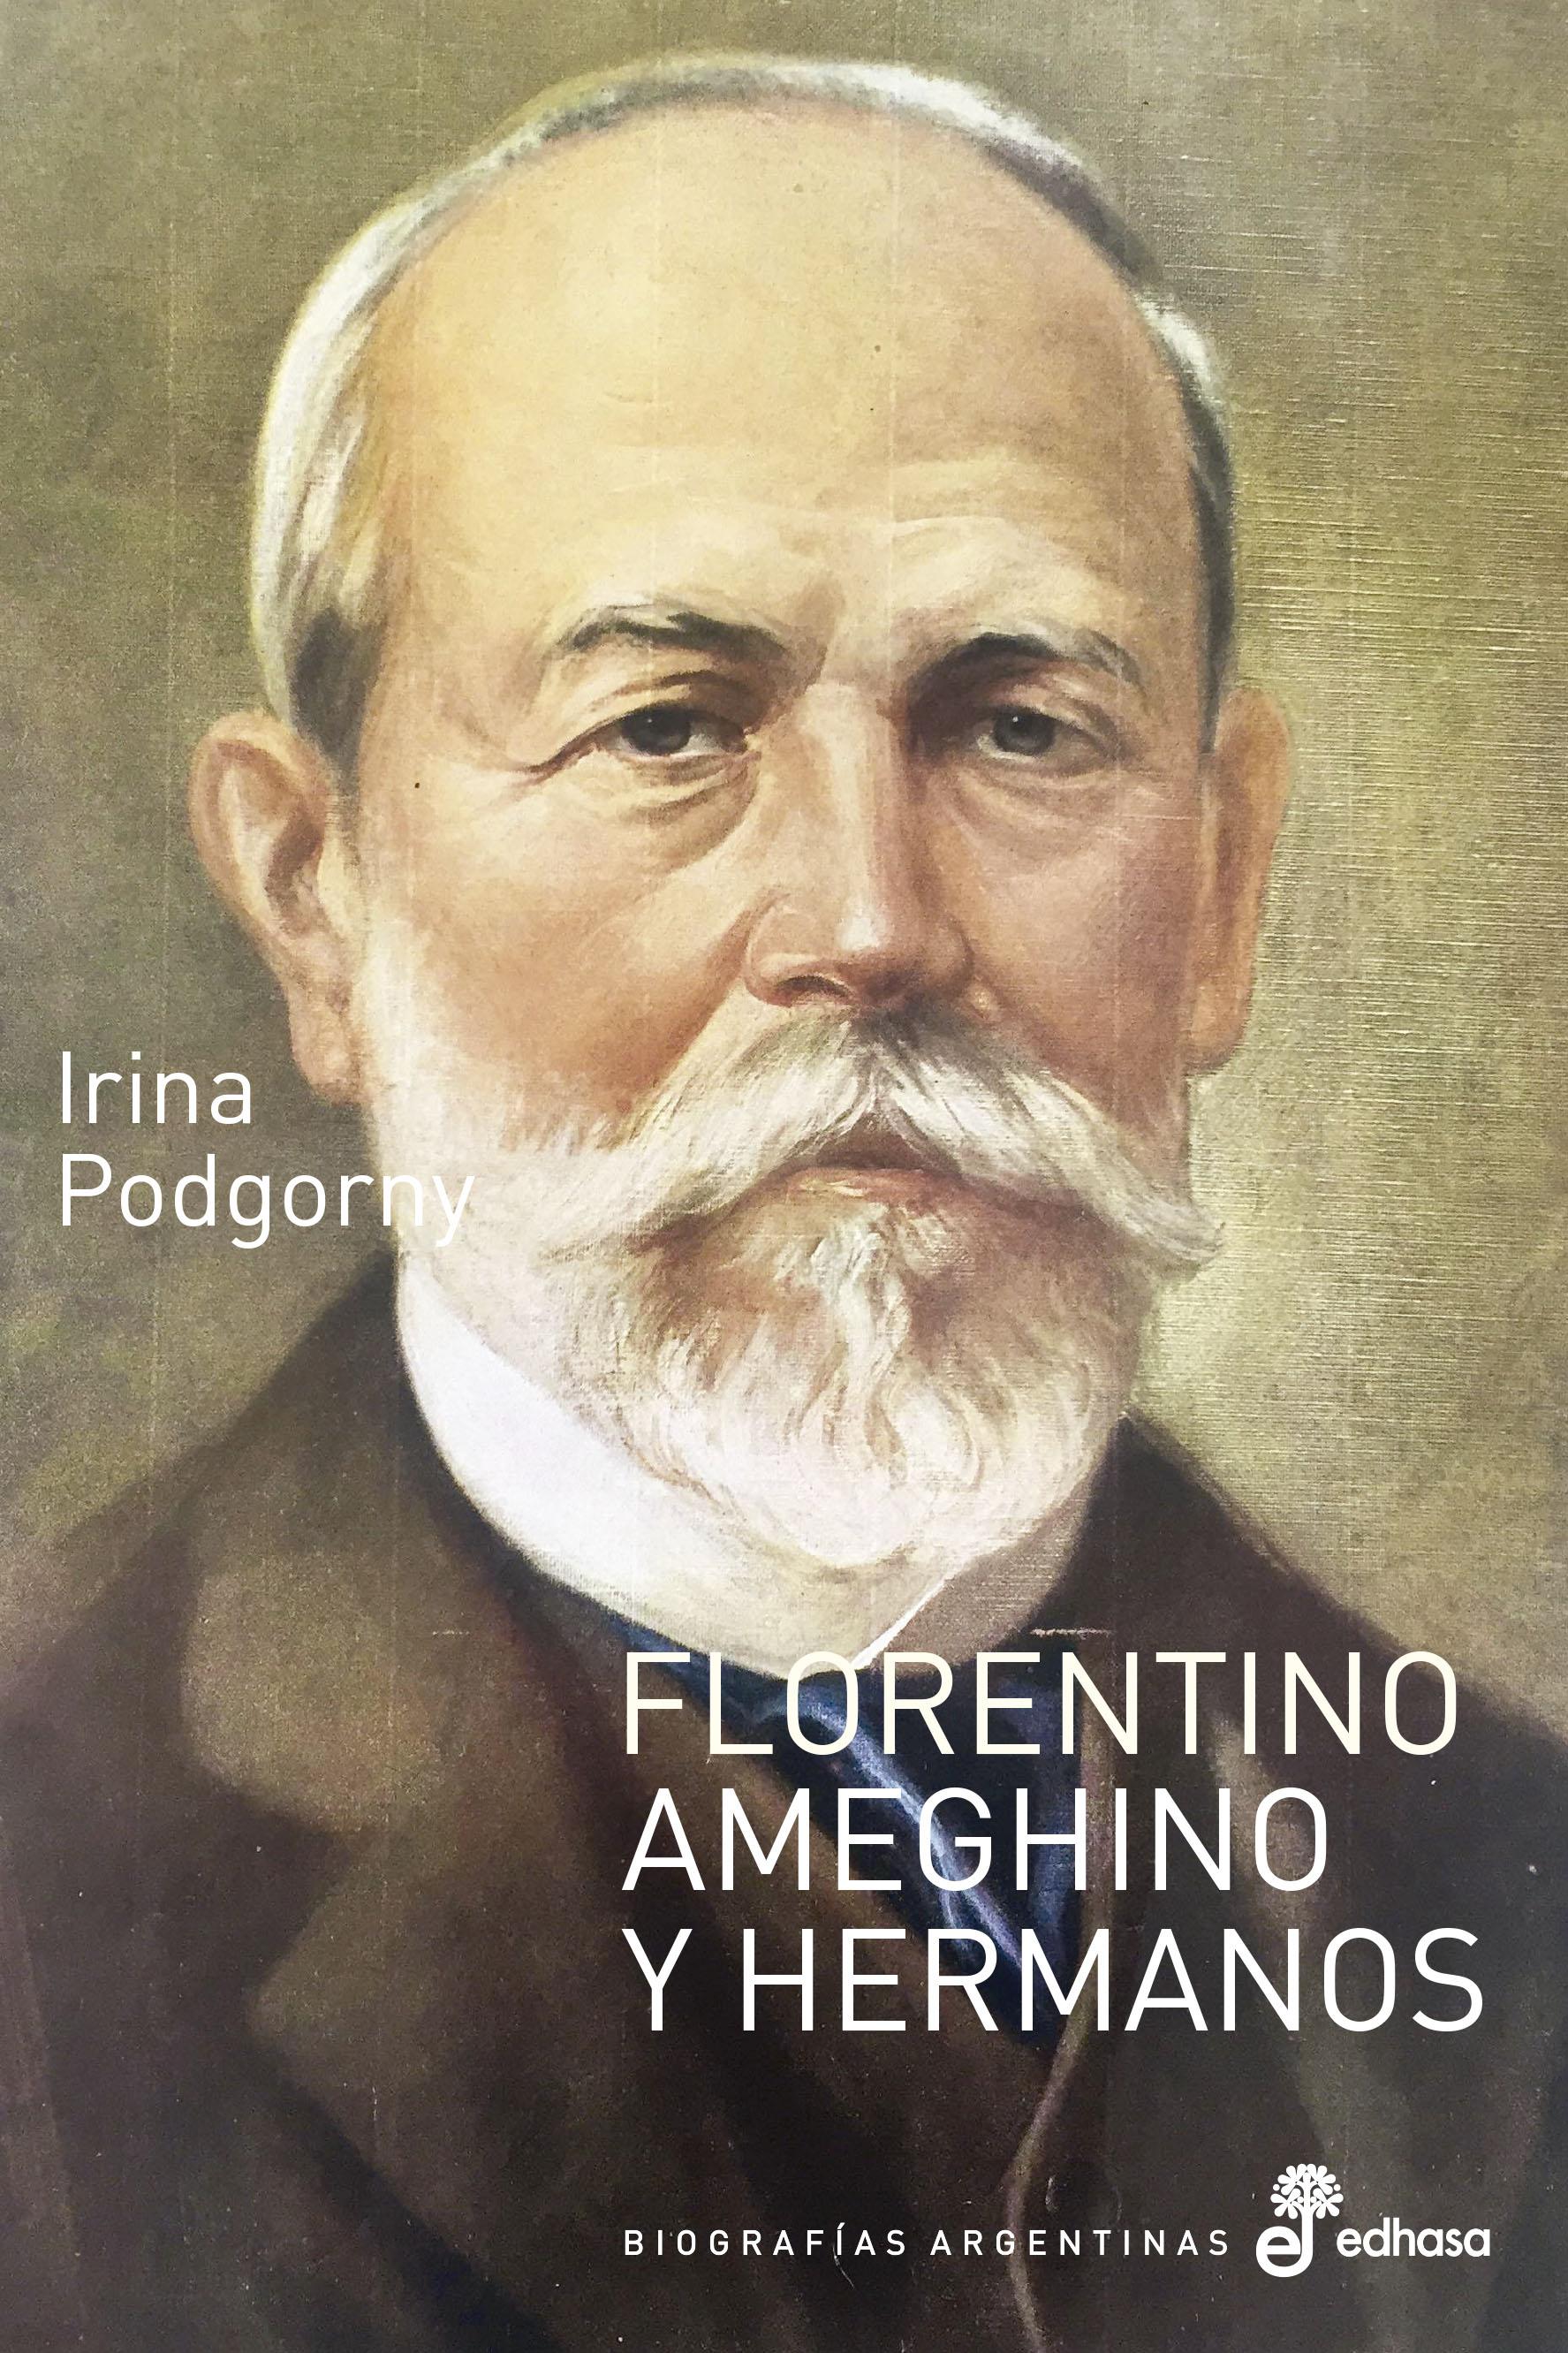 Florentino Ameghino y hermanos - Podgorny Irina